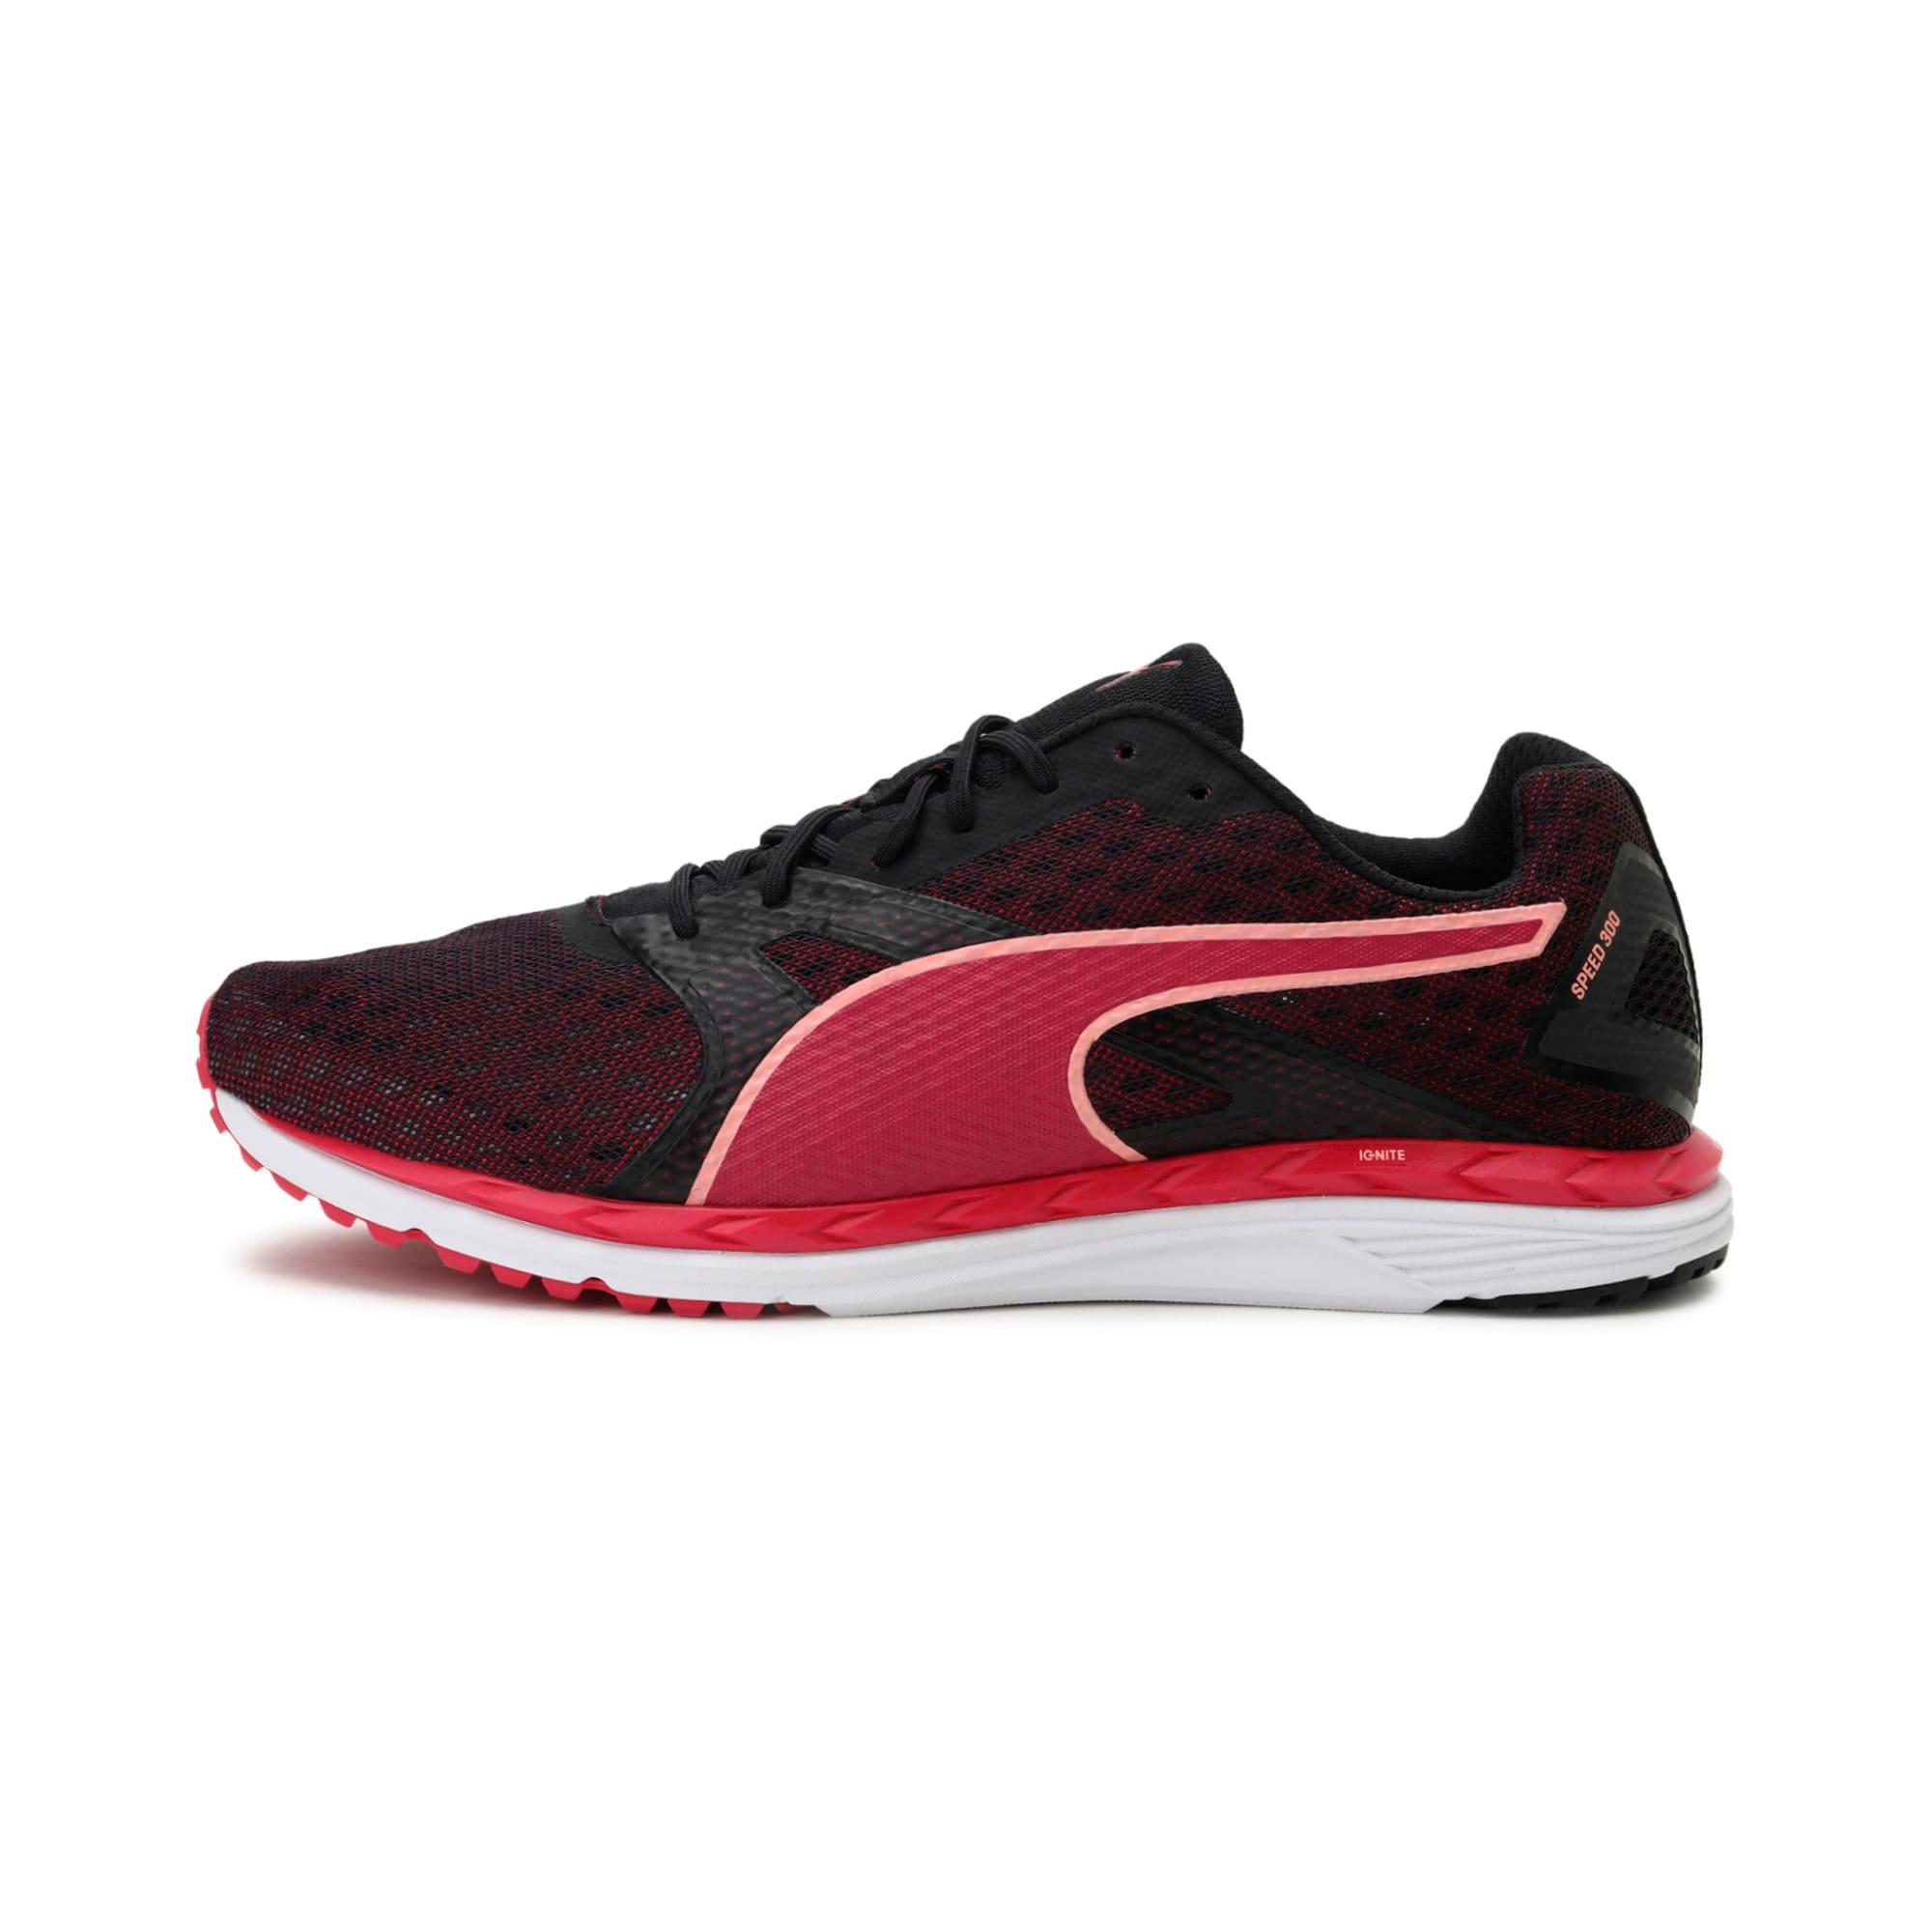 Thumbnail 1 of Speed 300 IGNITE 2 Women's Running Shoes, Love Potion-Puma Black, medium-IND